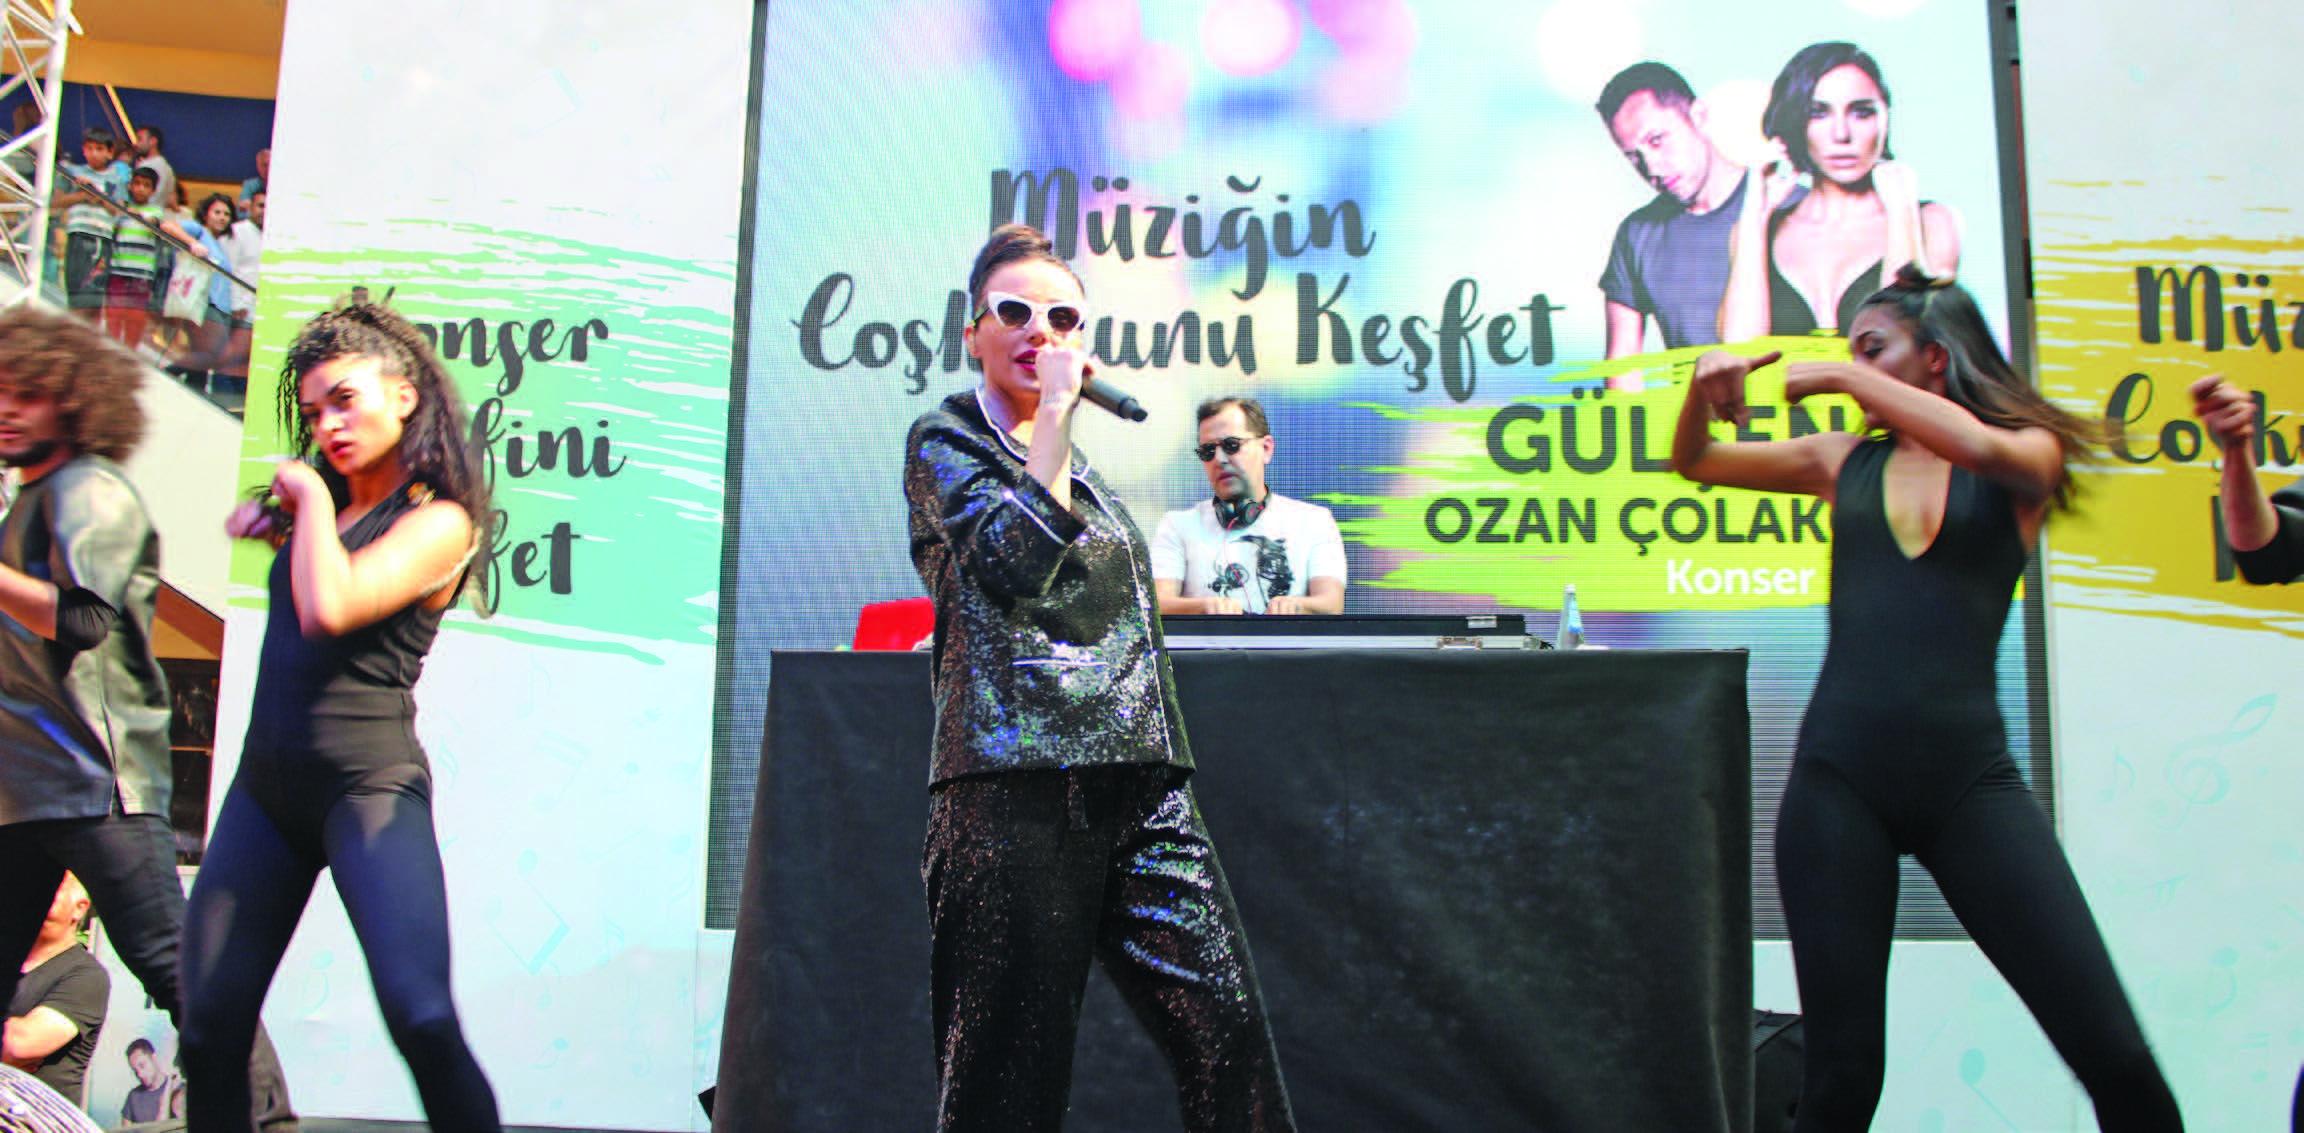 Optimum İzmir'de Gülşen coşkusu